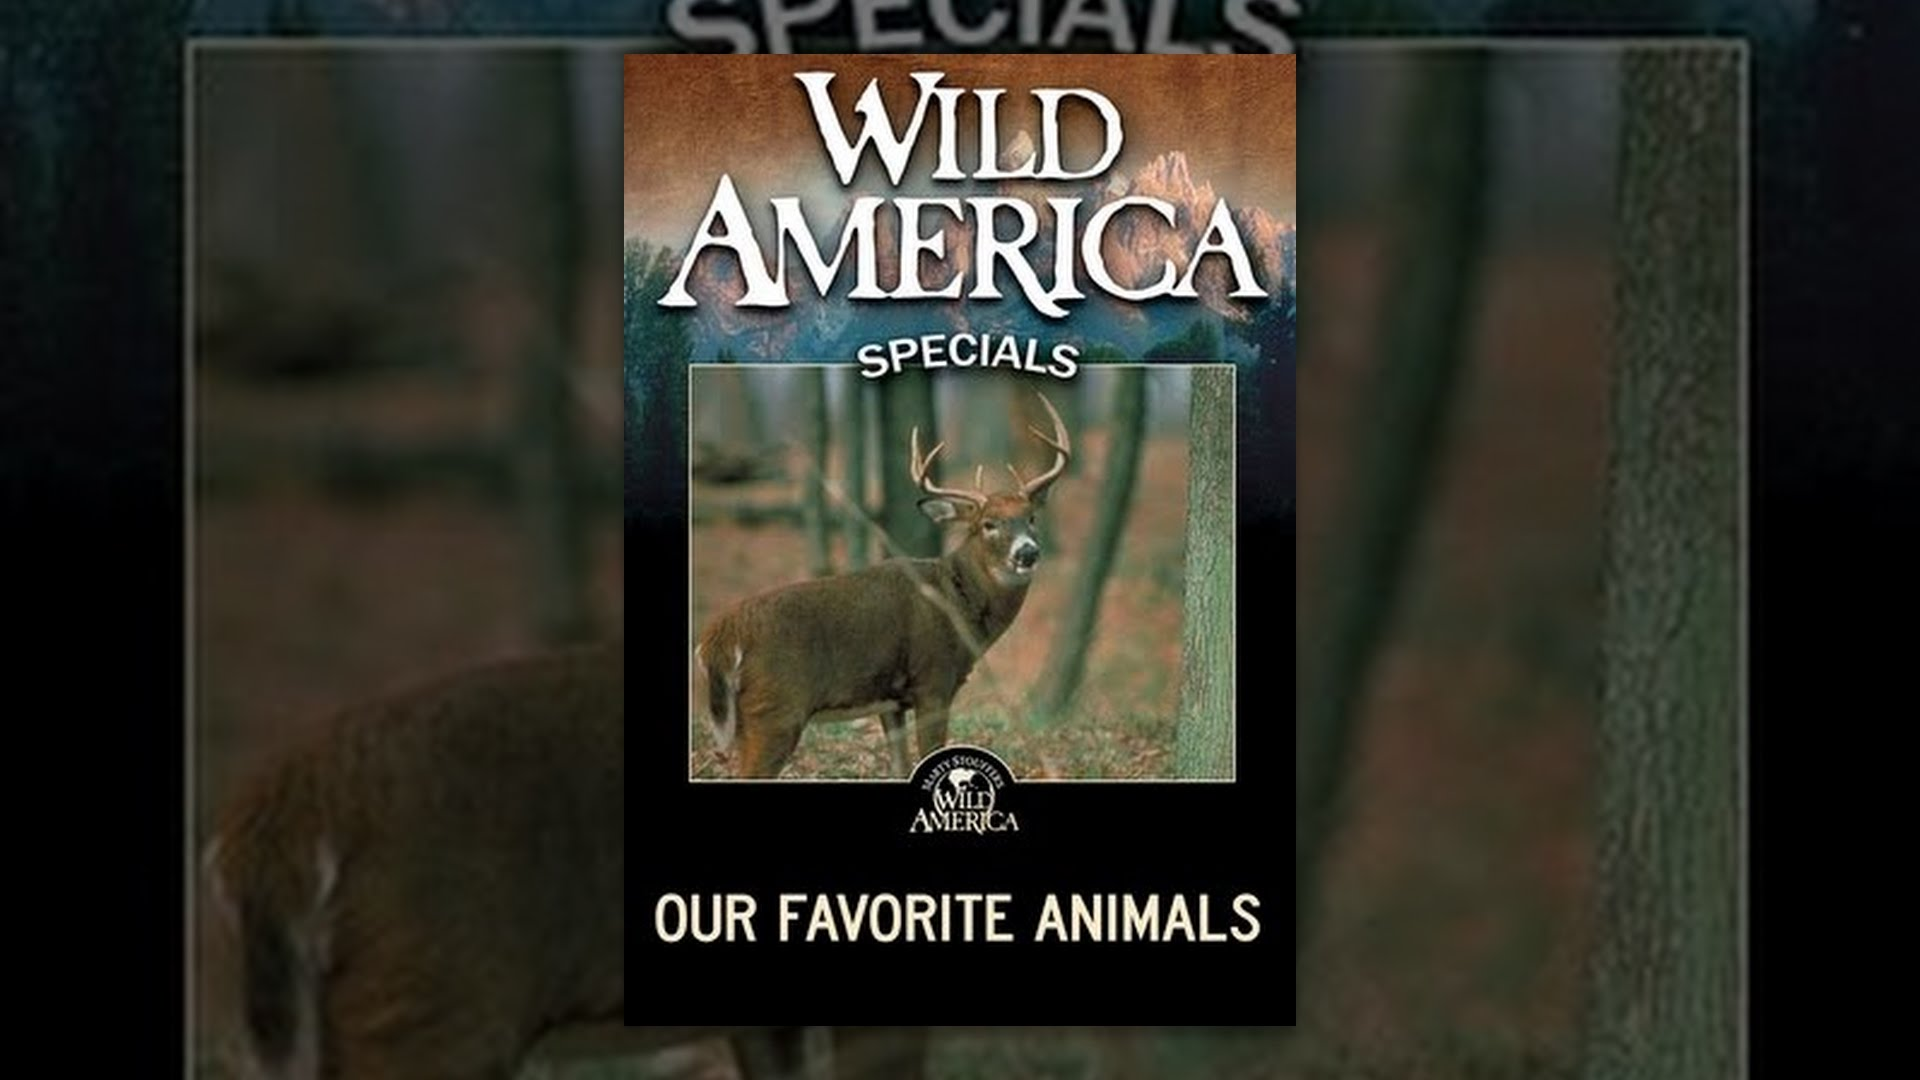 Wild America Specials: Our Favorite Animals